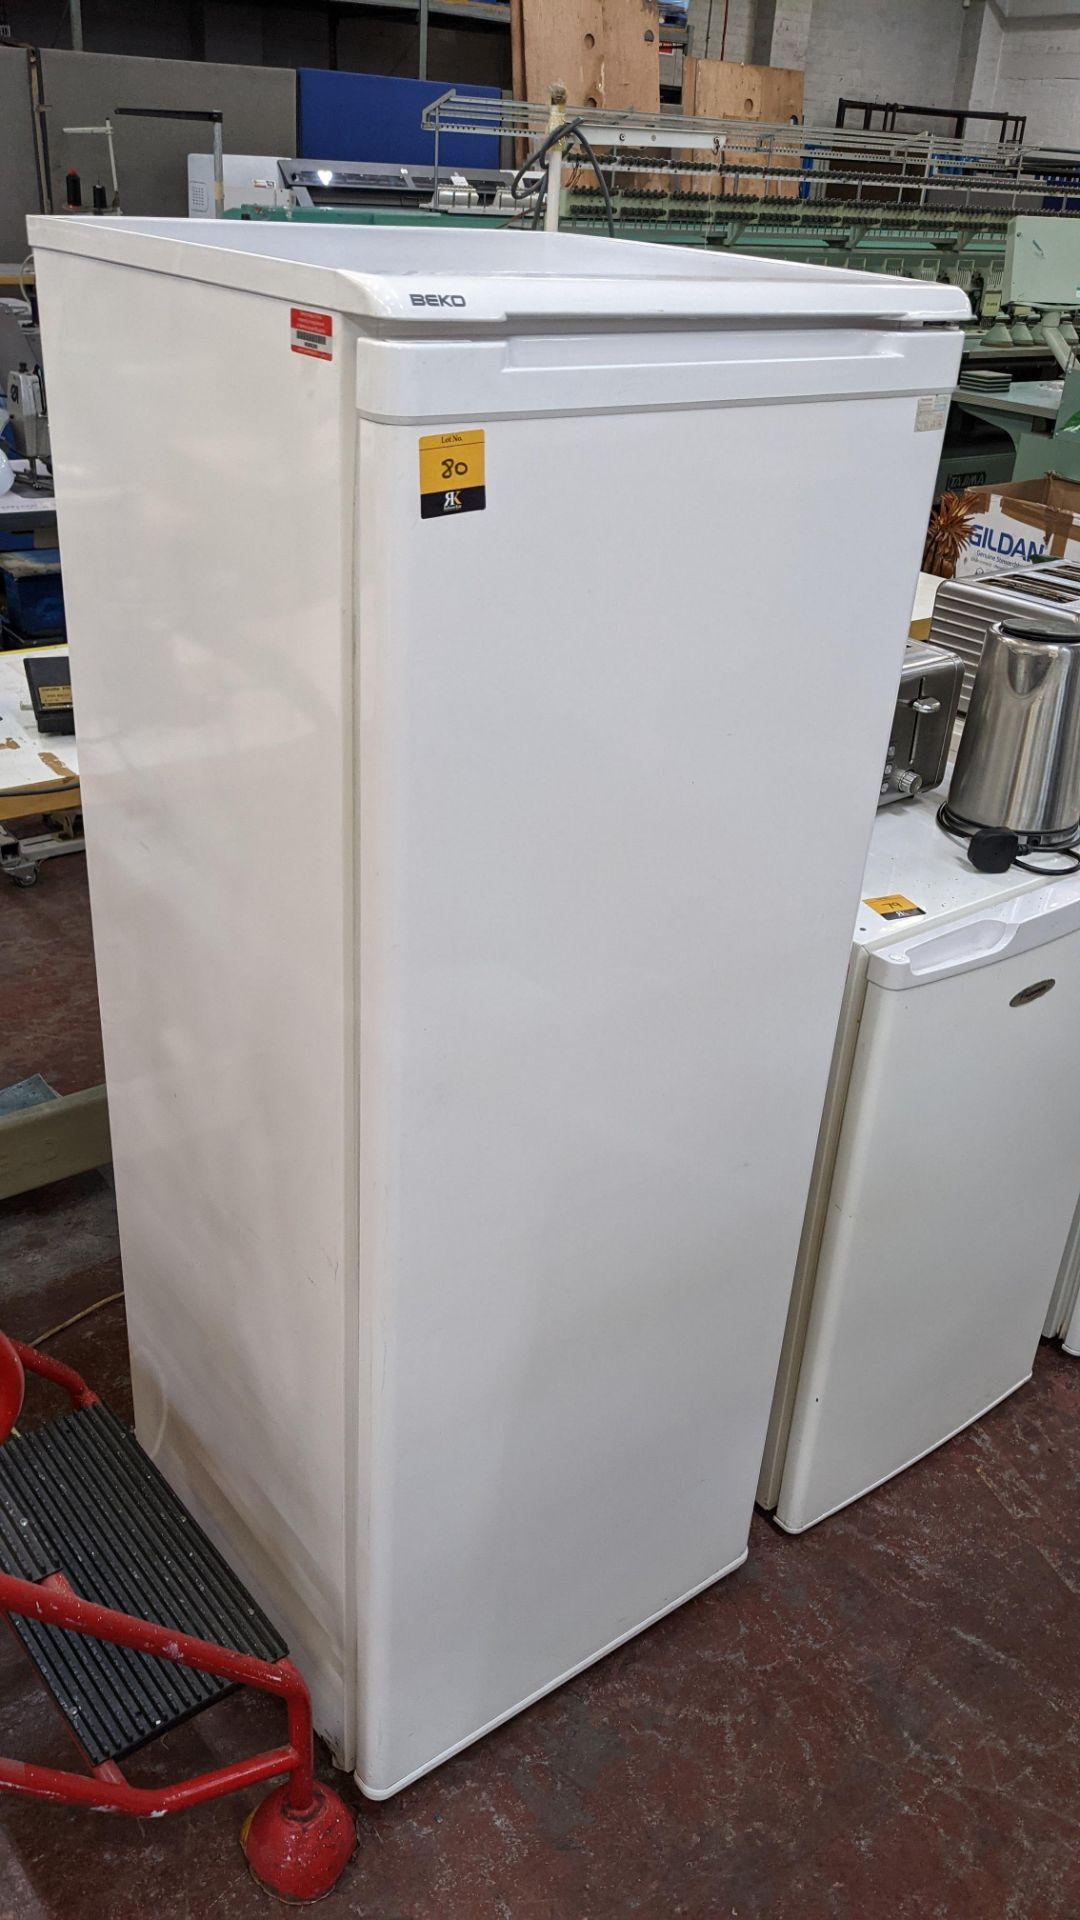 Beko tall fridge - Image 3 of 5